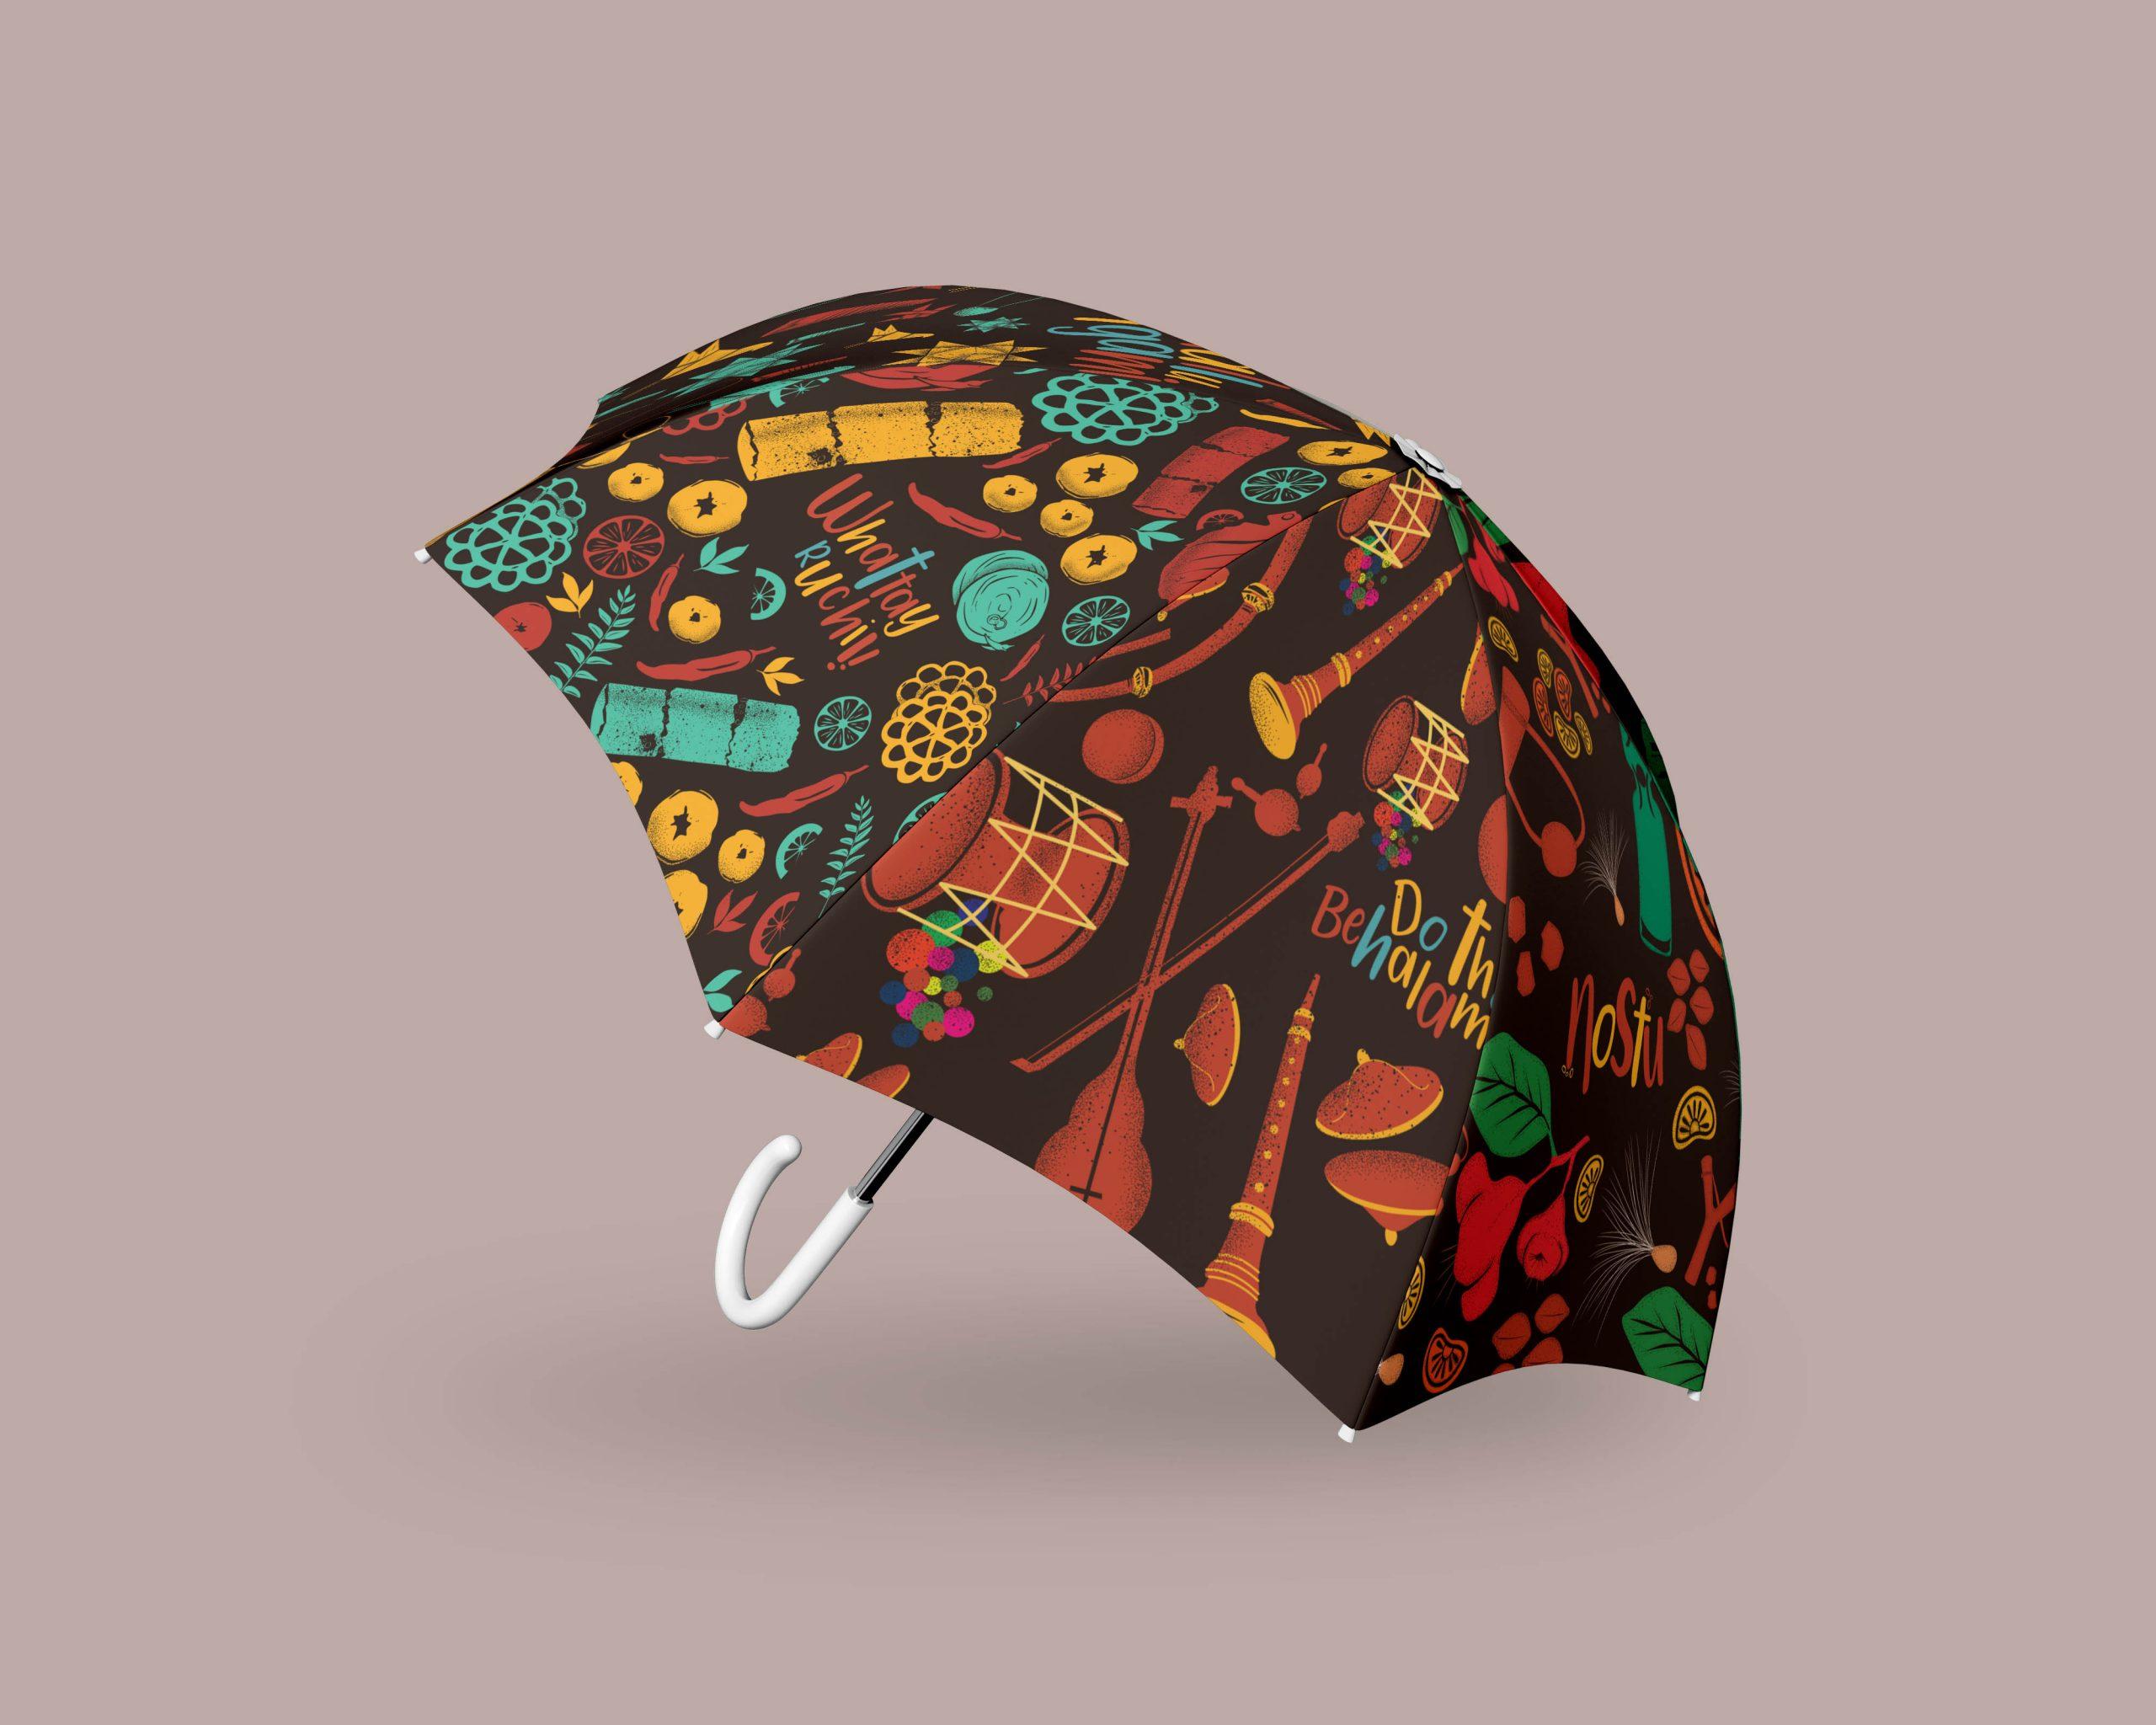 Monsoon Art Umbrella for Zee Keralam | Umbrella mock-up 4 by Stark Communications Pvt Ltd